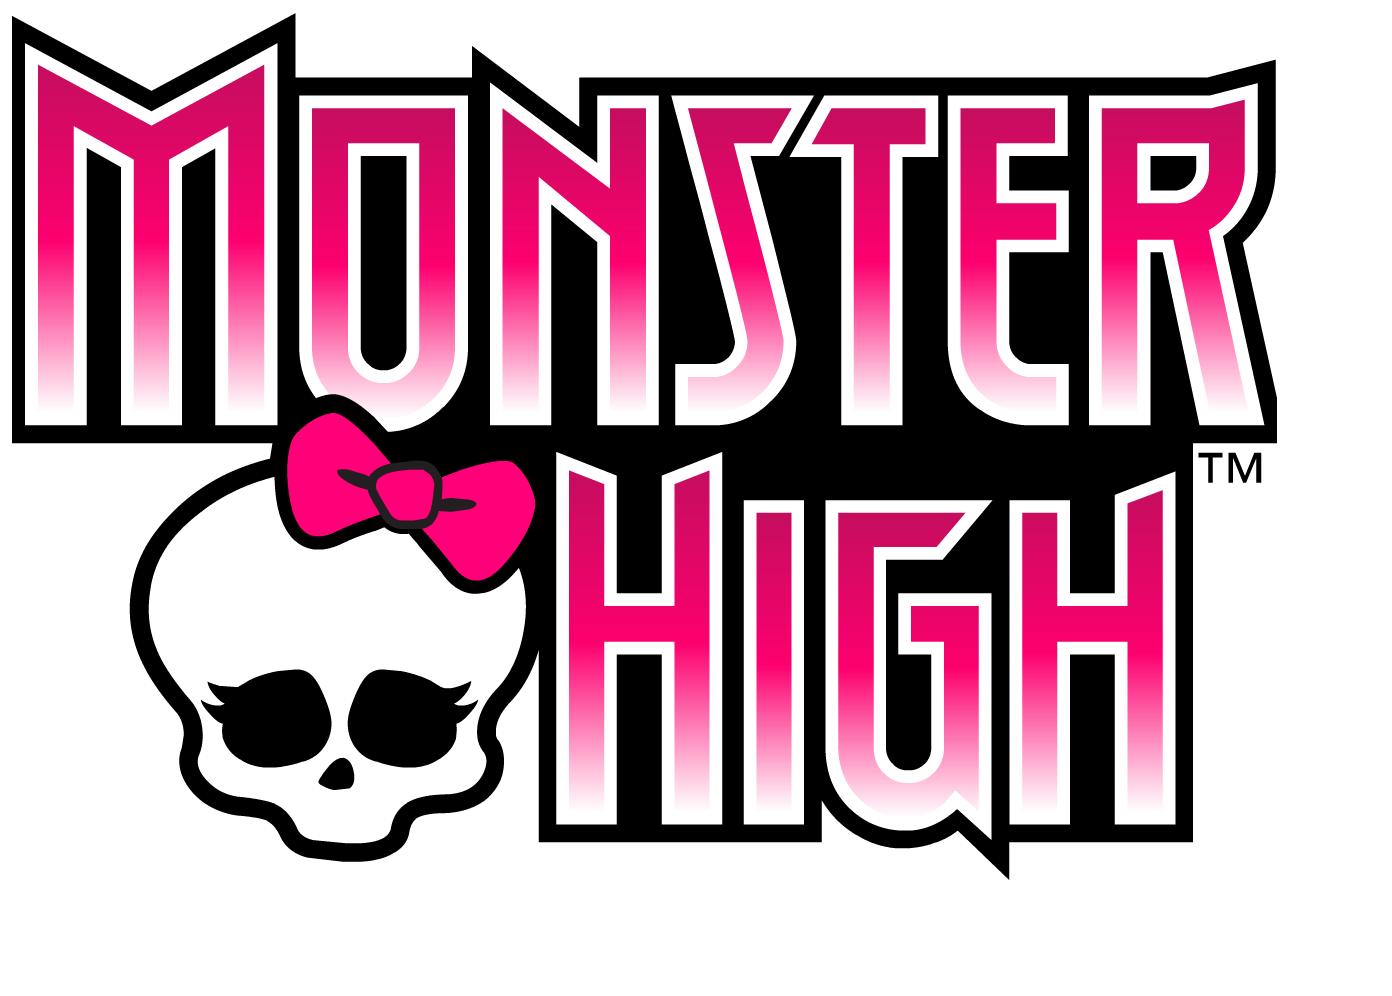 Znalezione obrazy dla zapytania logo monster high